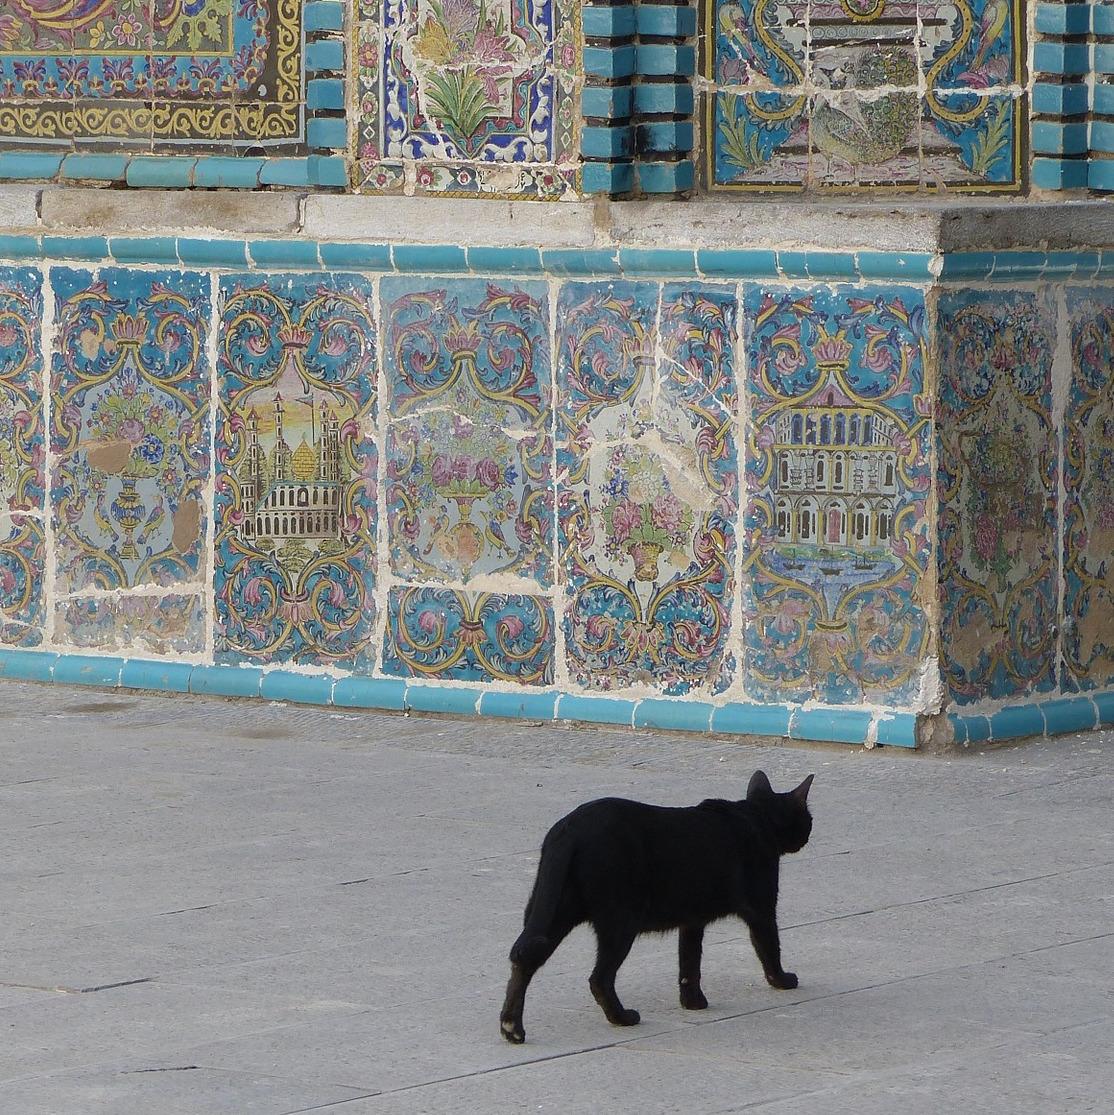 coursera01w02/images/cat_in_iran.jpg